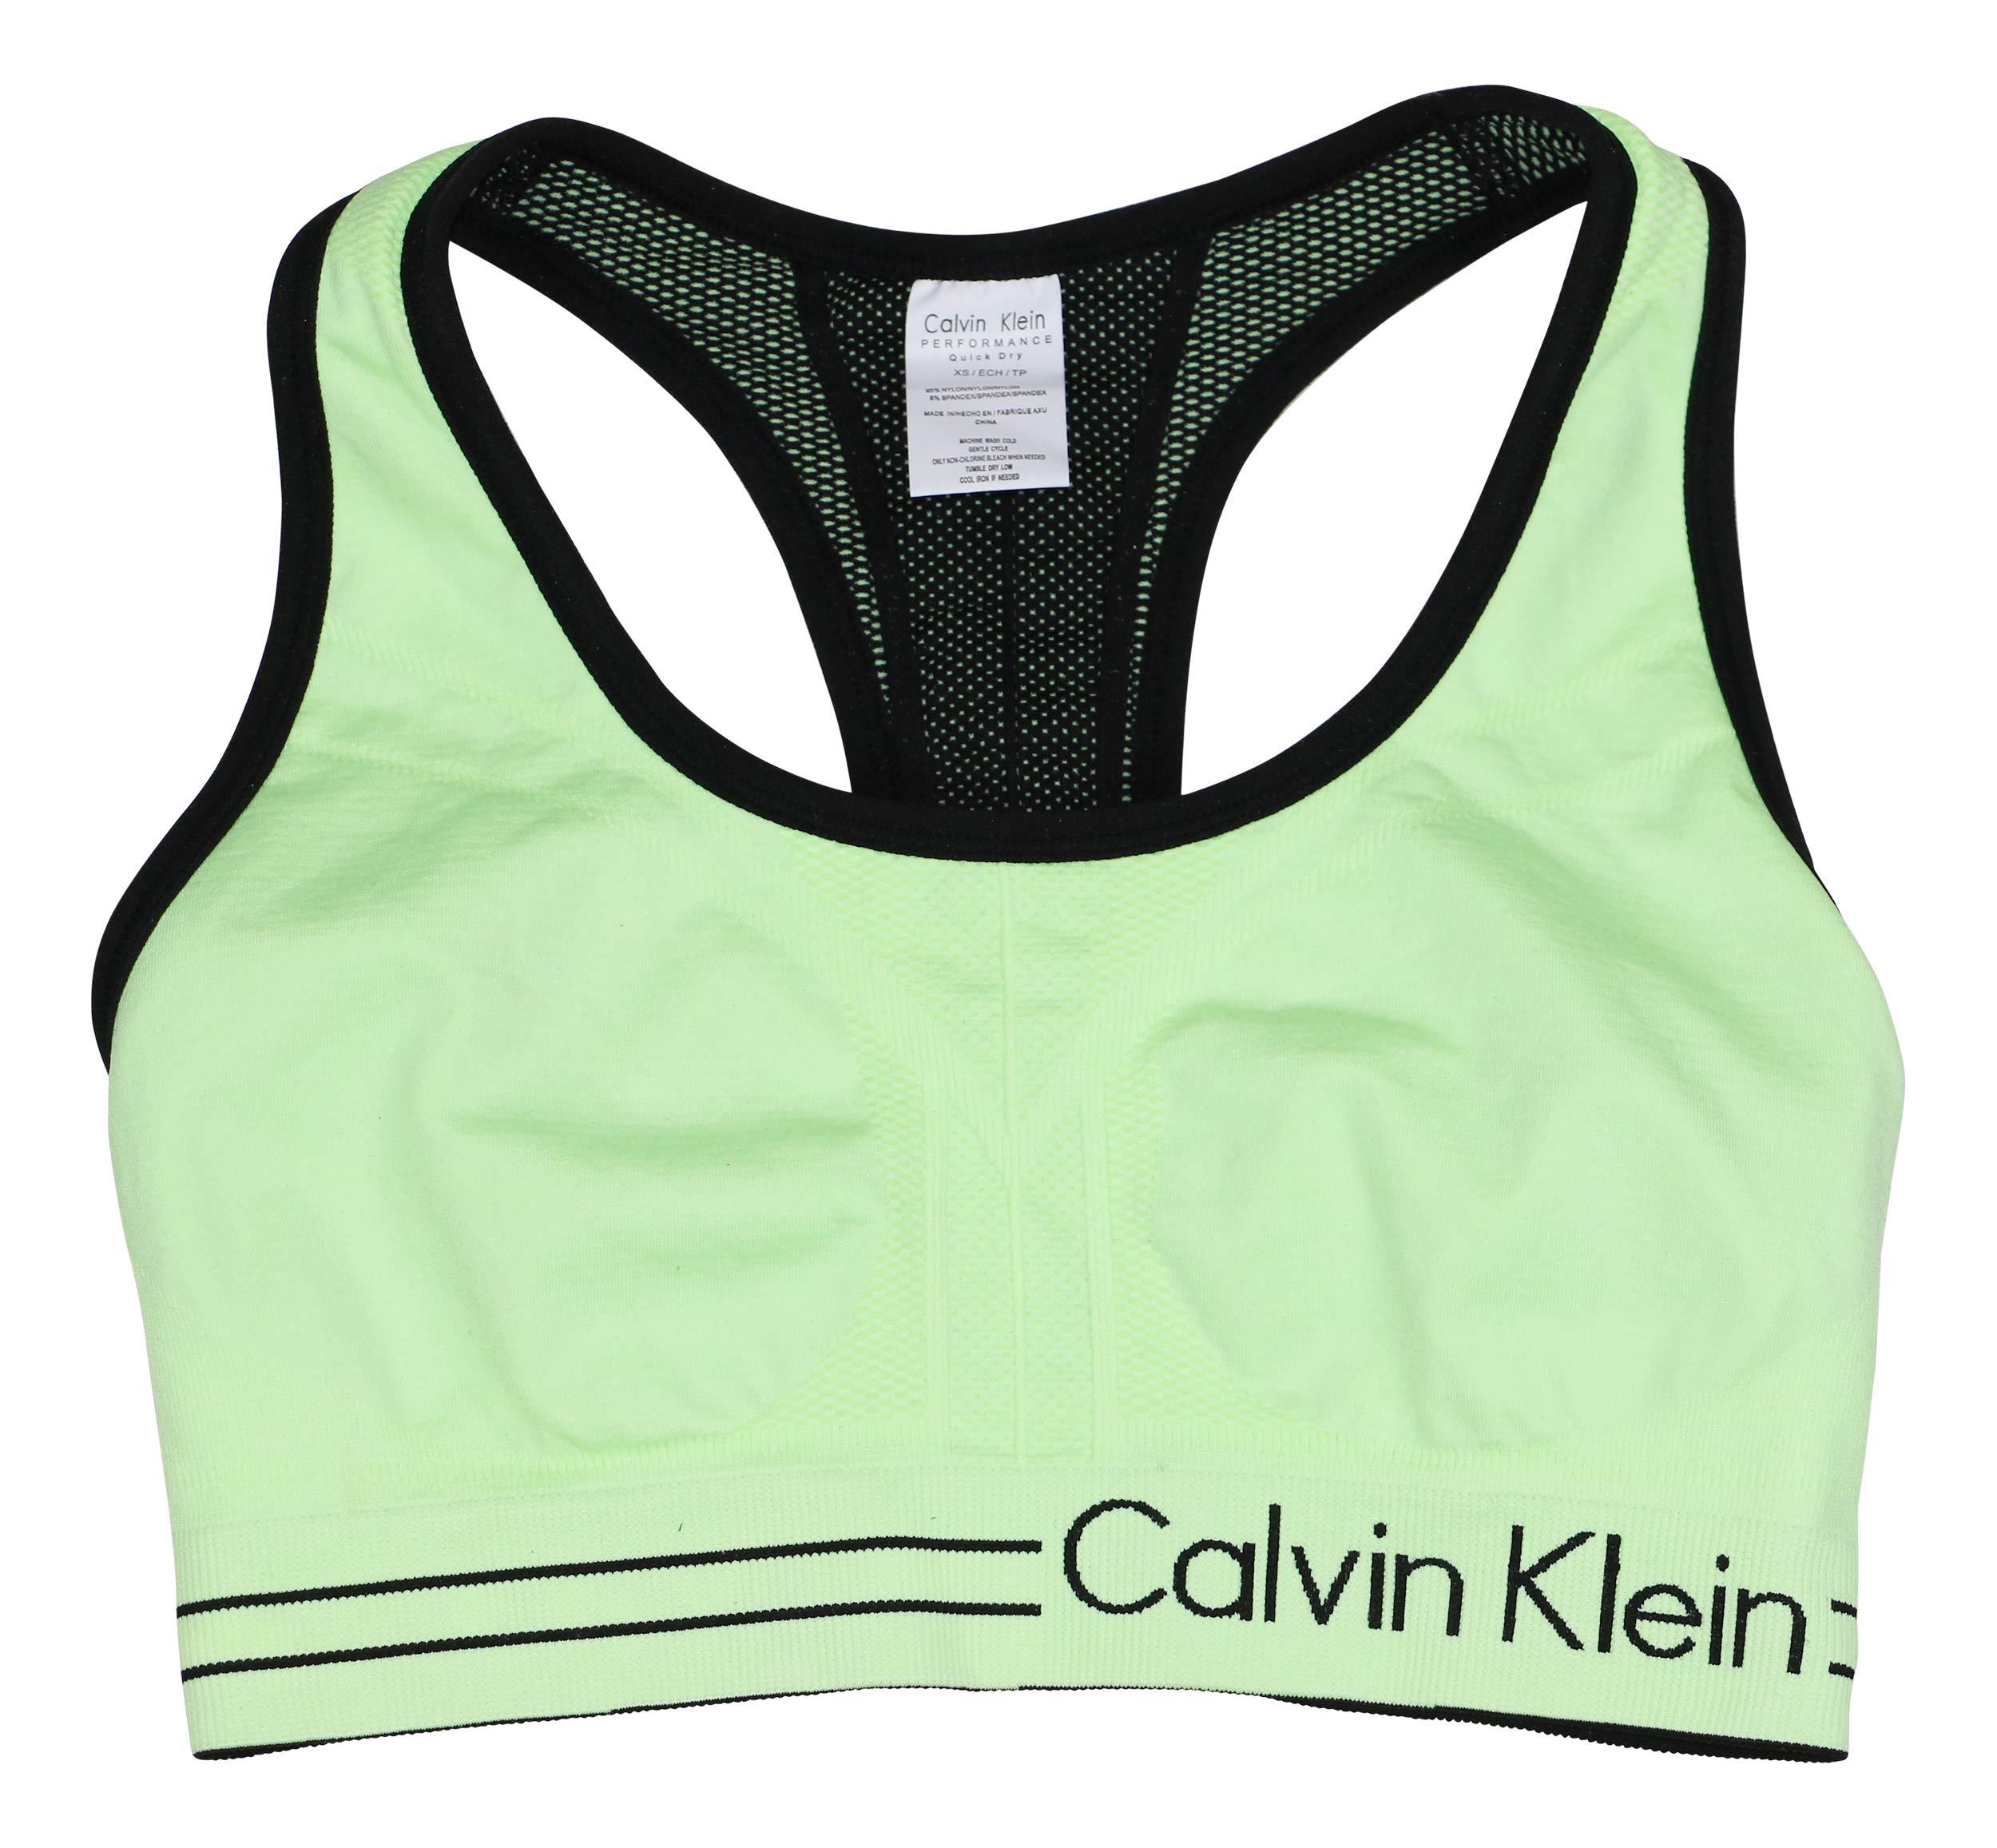 Calvin Klein Reversible Racerback Medium Impact Sports Bra (Mint, X-Small)